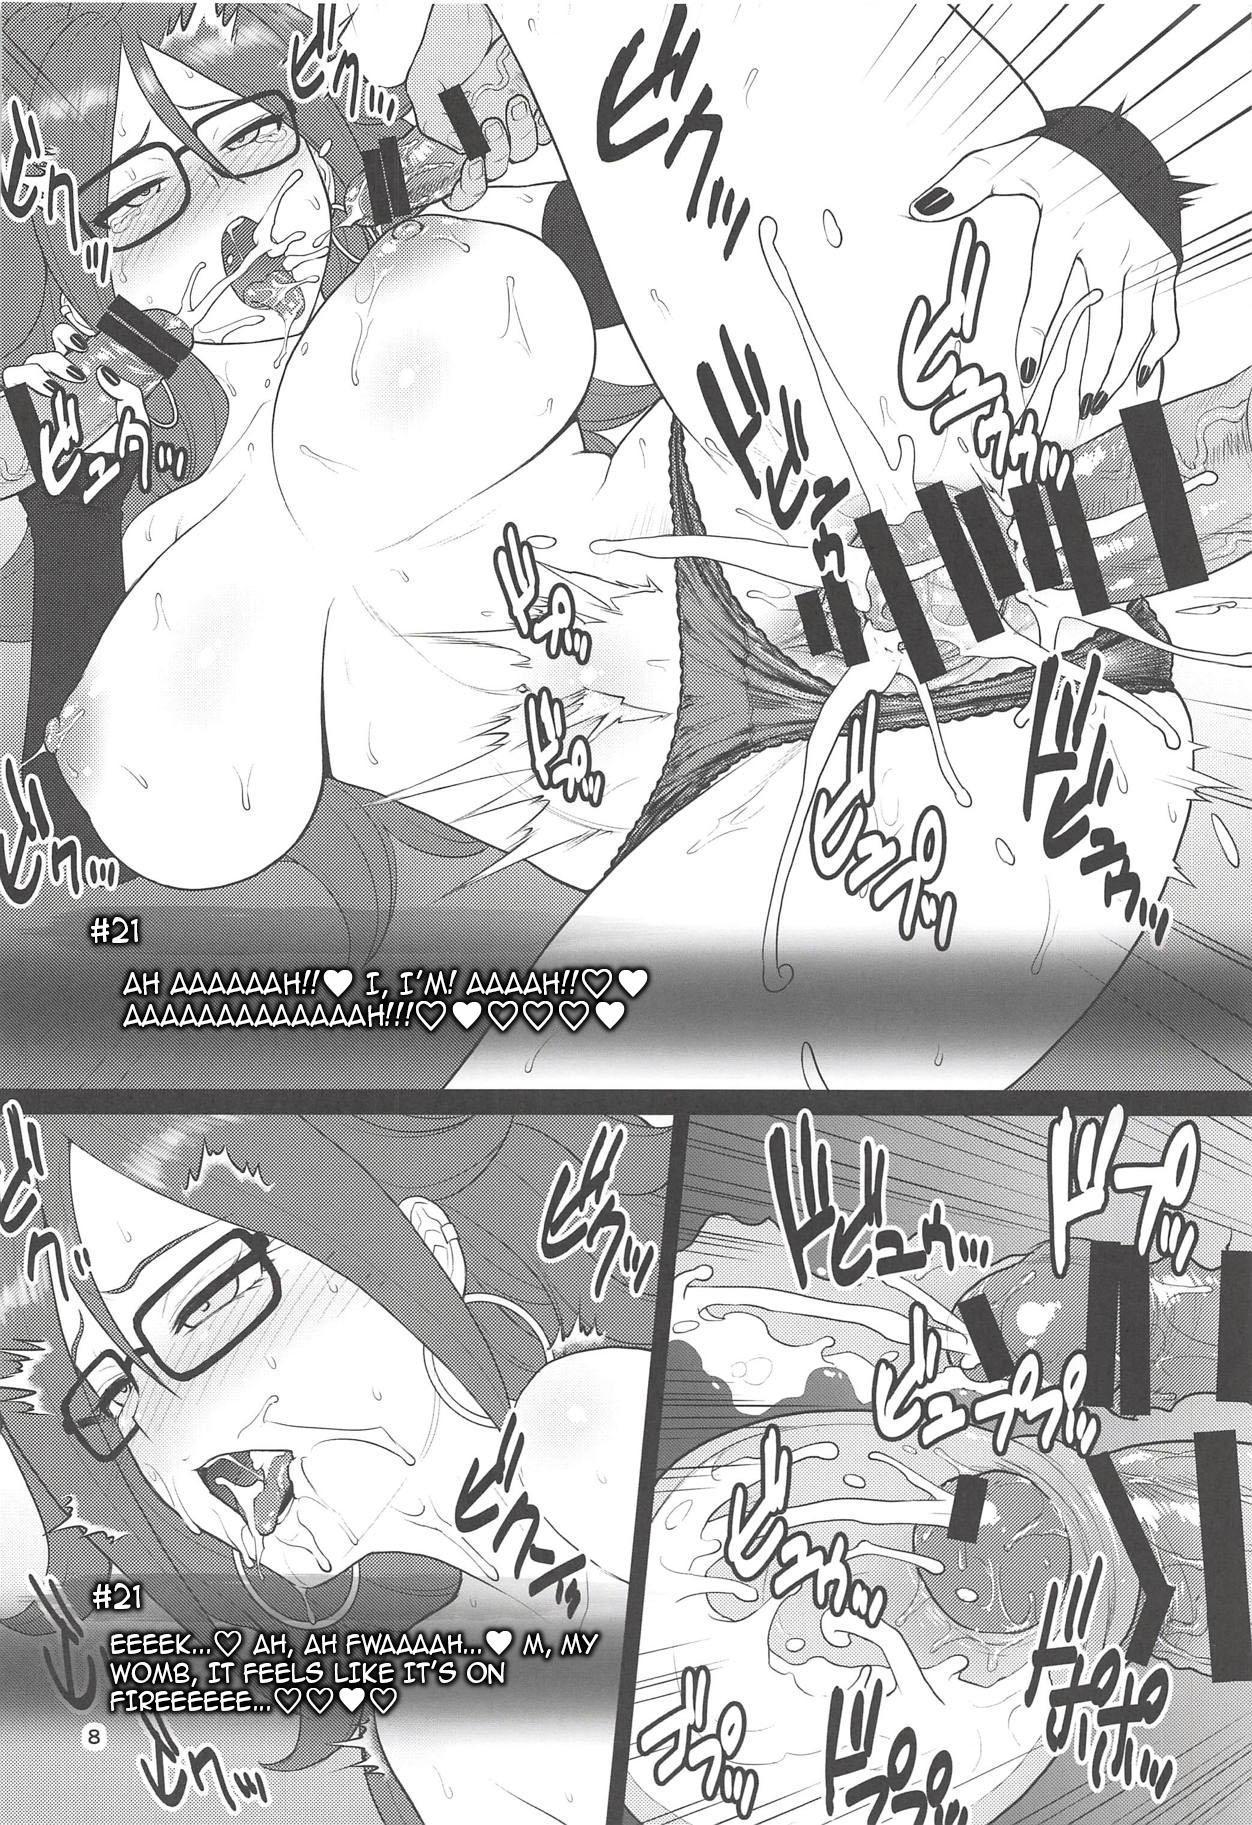 (C94) [Shinnihon Pepsitou (St.germain-sal)] 1-tsubu de 2-do Oishii | 2 for 1 Delicious Fun (Dragon Ball FighterZ) [English] {darknight} 6